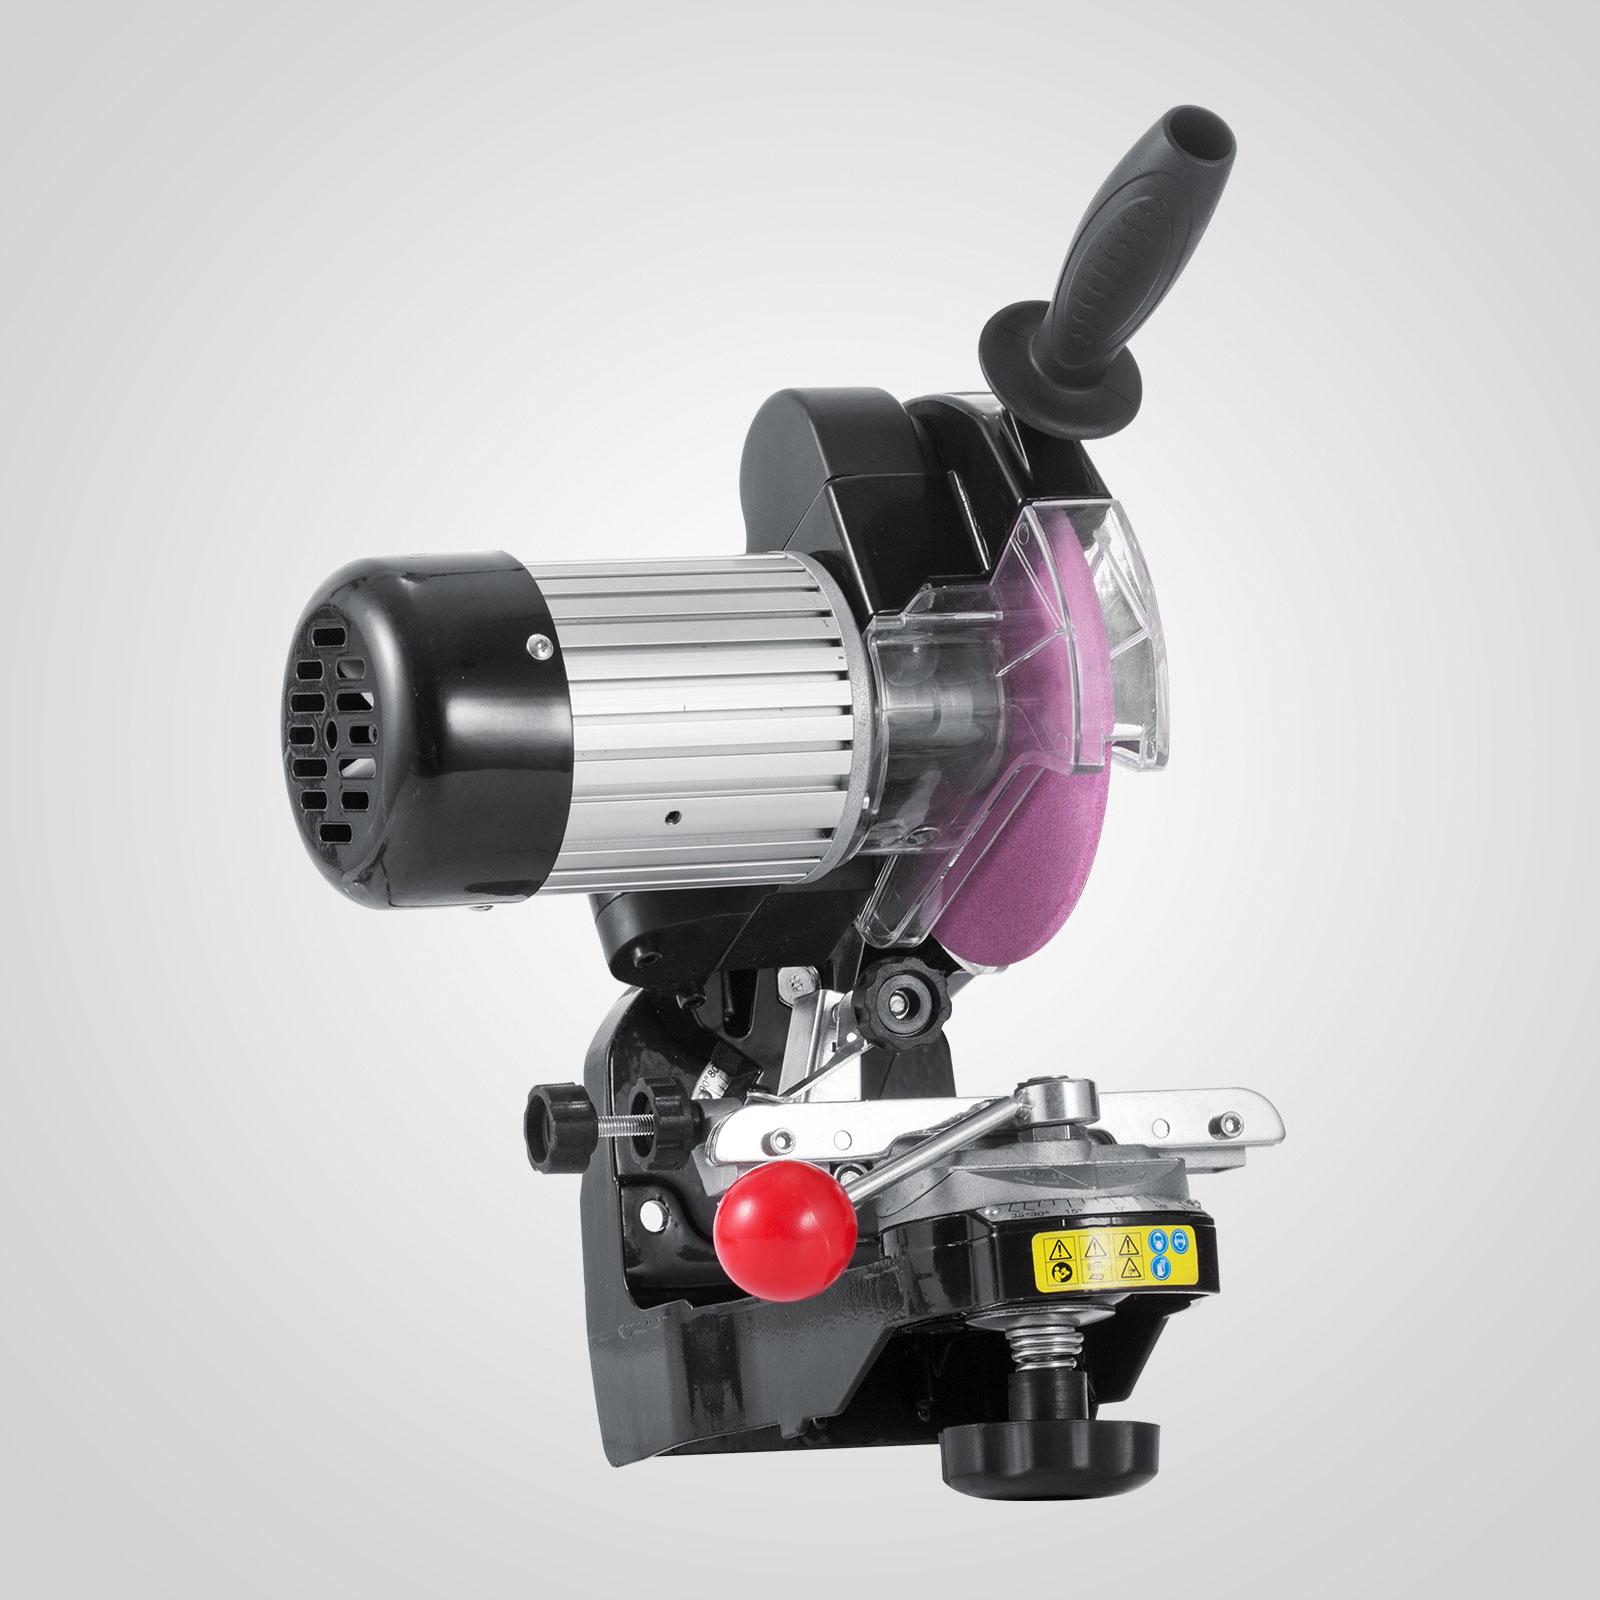 Chainsaw Sharpener Grinder W Grinding Wheels Electric 1 8